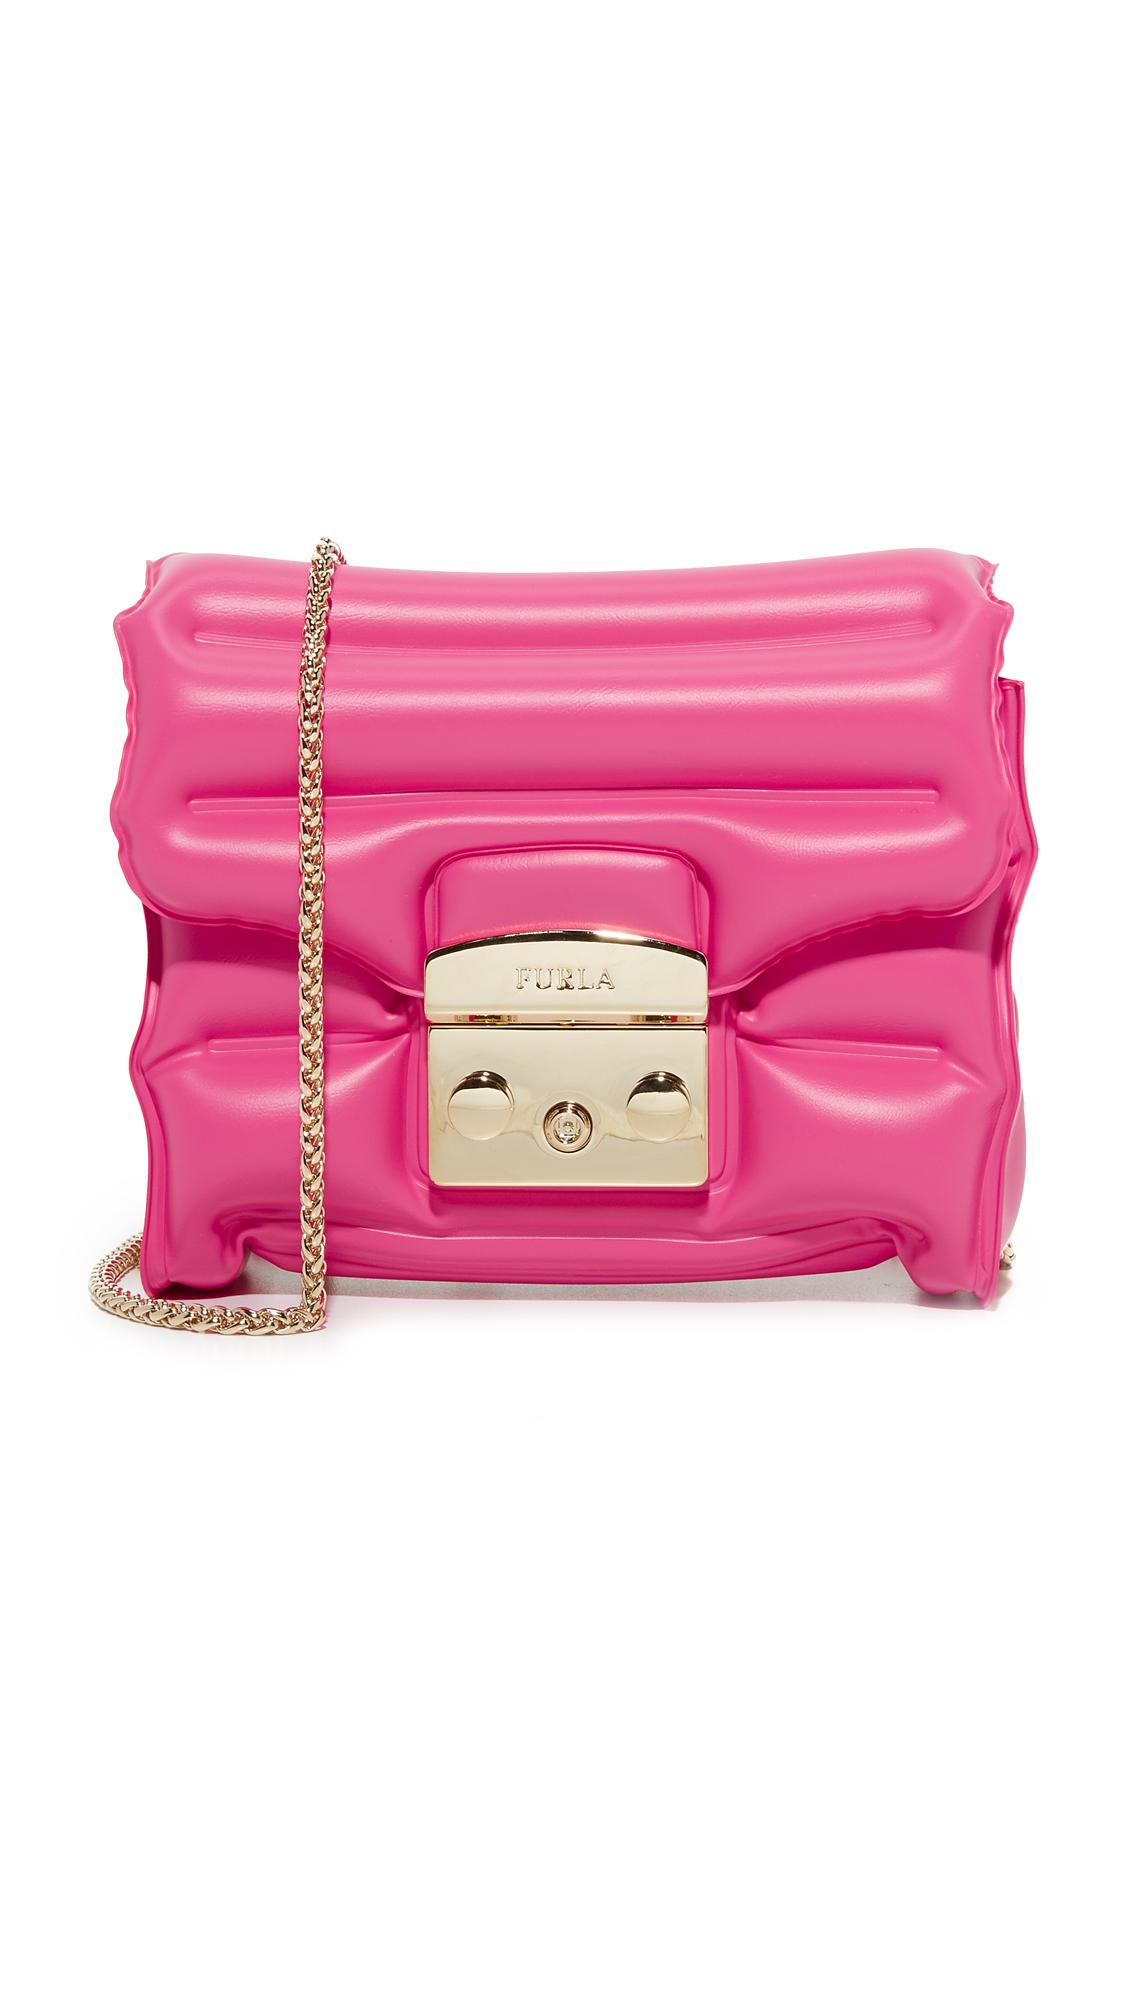 Luxefinds Fashion Shopping Engine Furla Agata Oxygen Metropolis Cross Body Bag